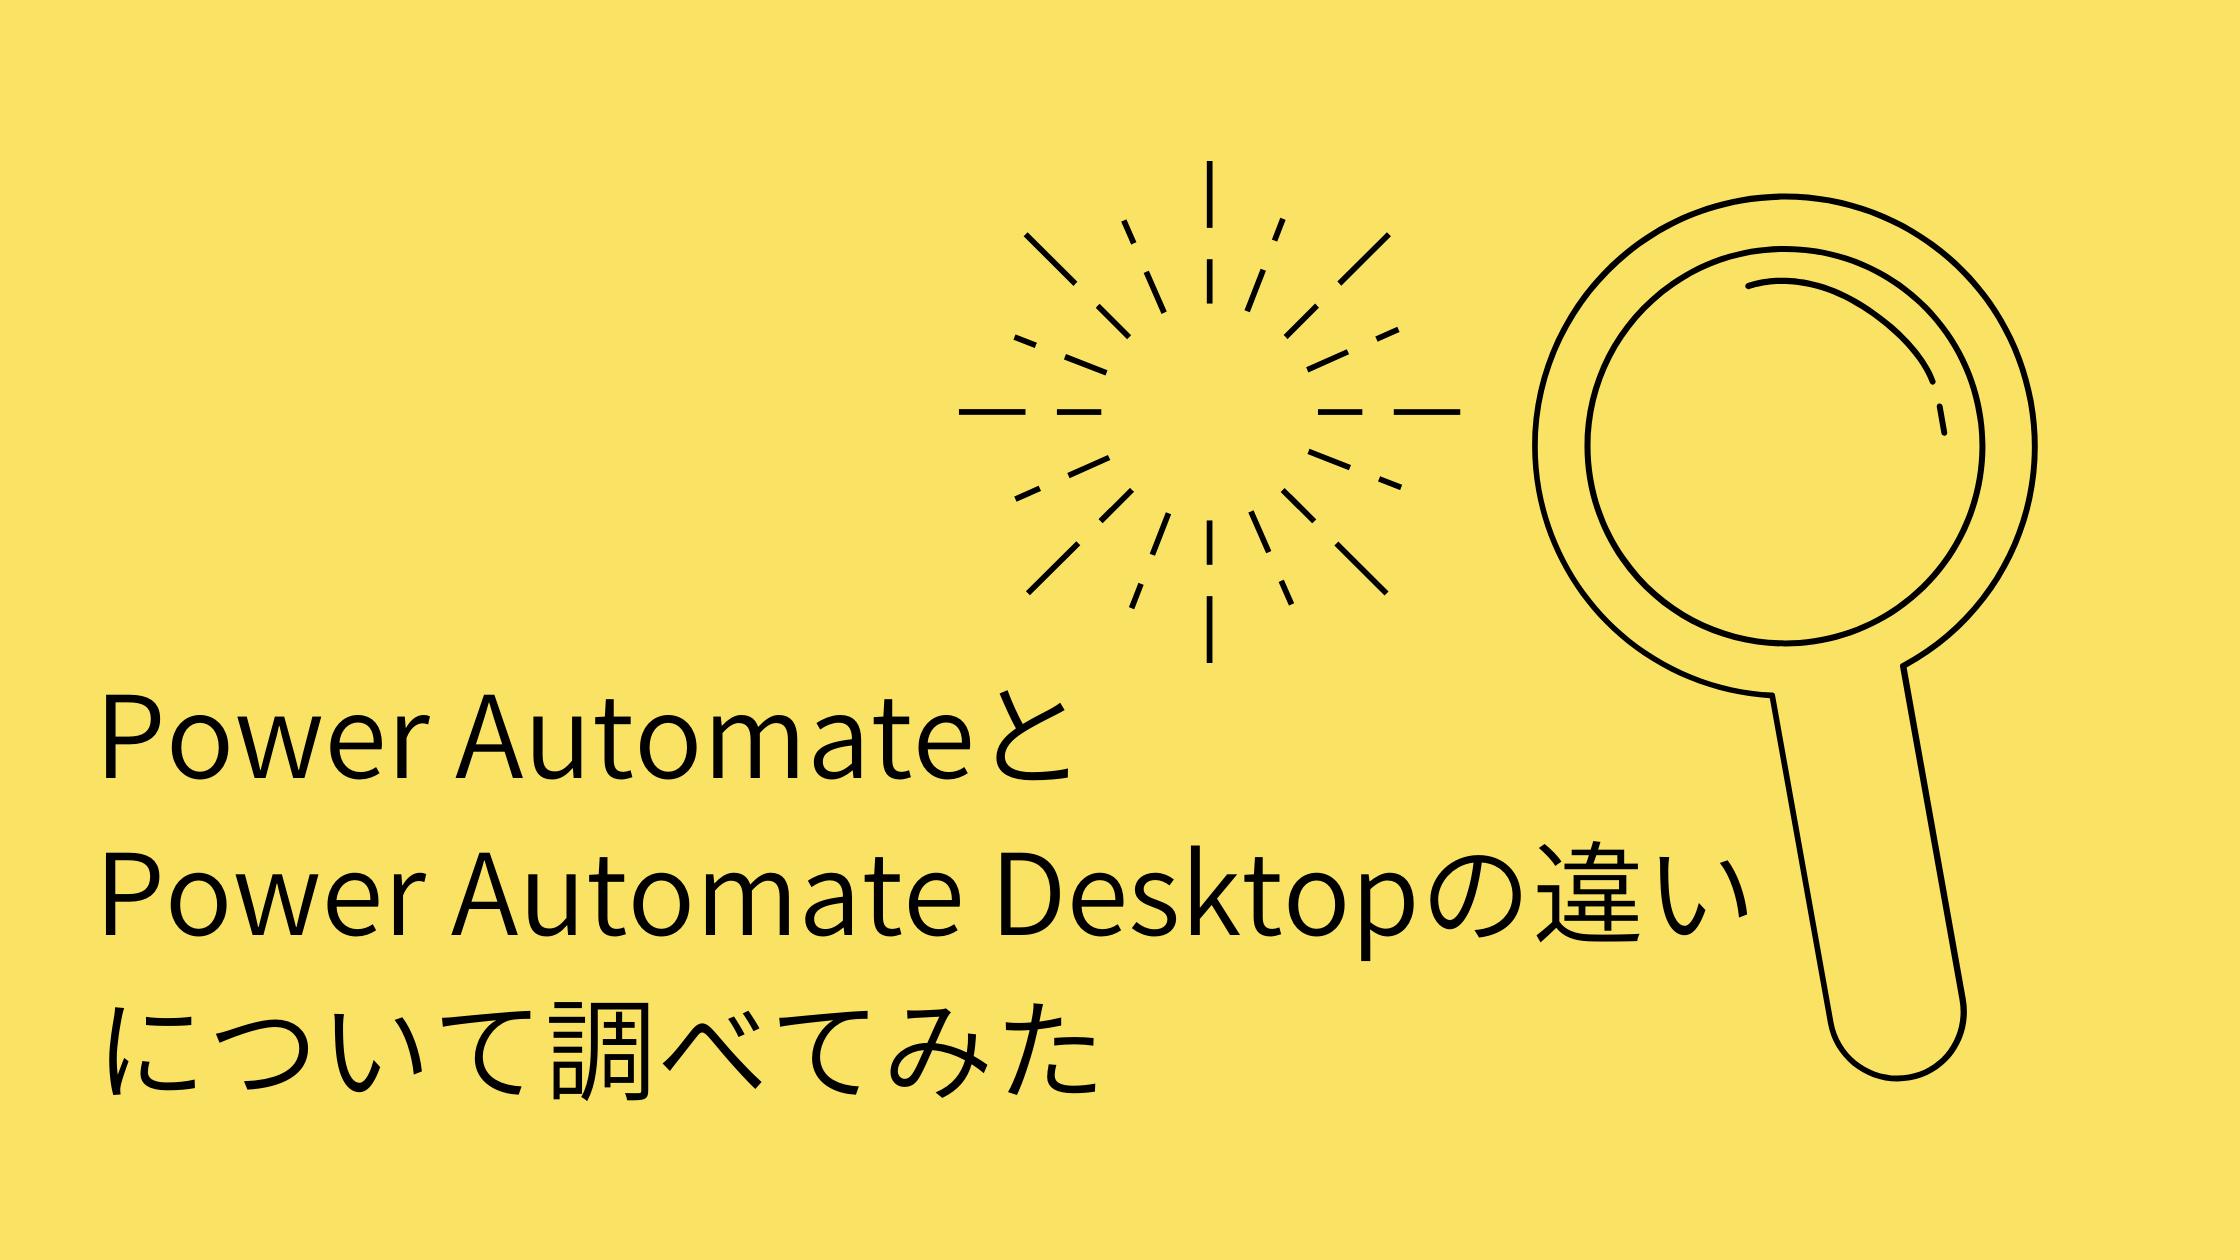 Power AutomateとPower Automate Desktopの違いについて調べてみた